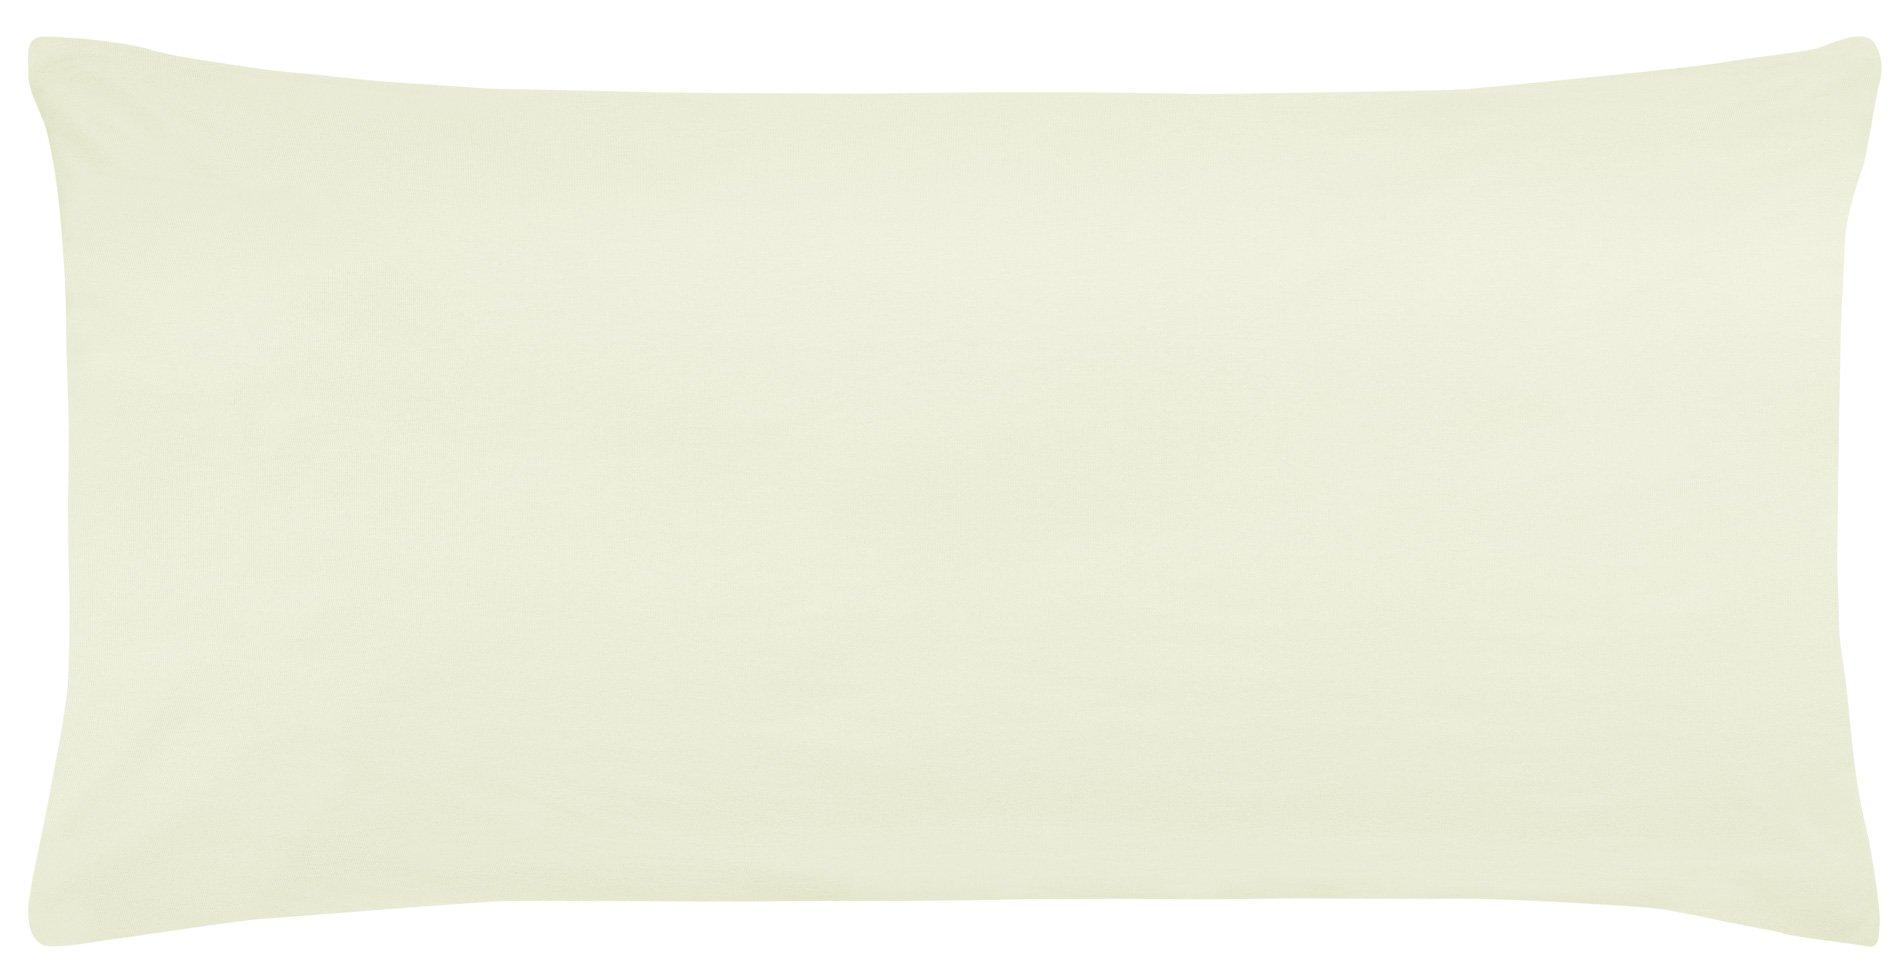 Edel-Zwirn-Jersey natur B40cm